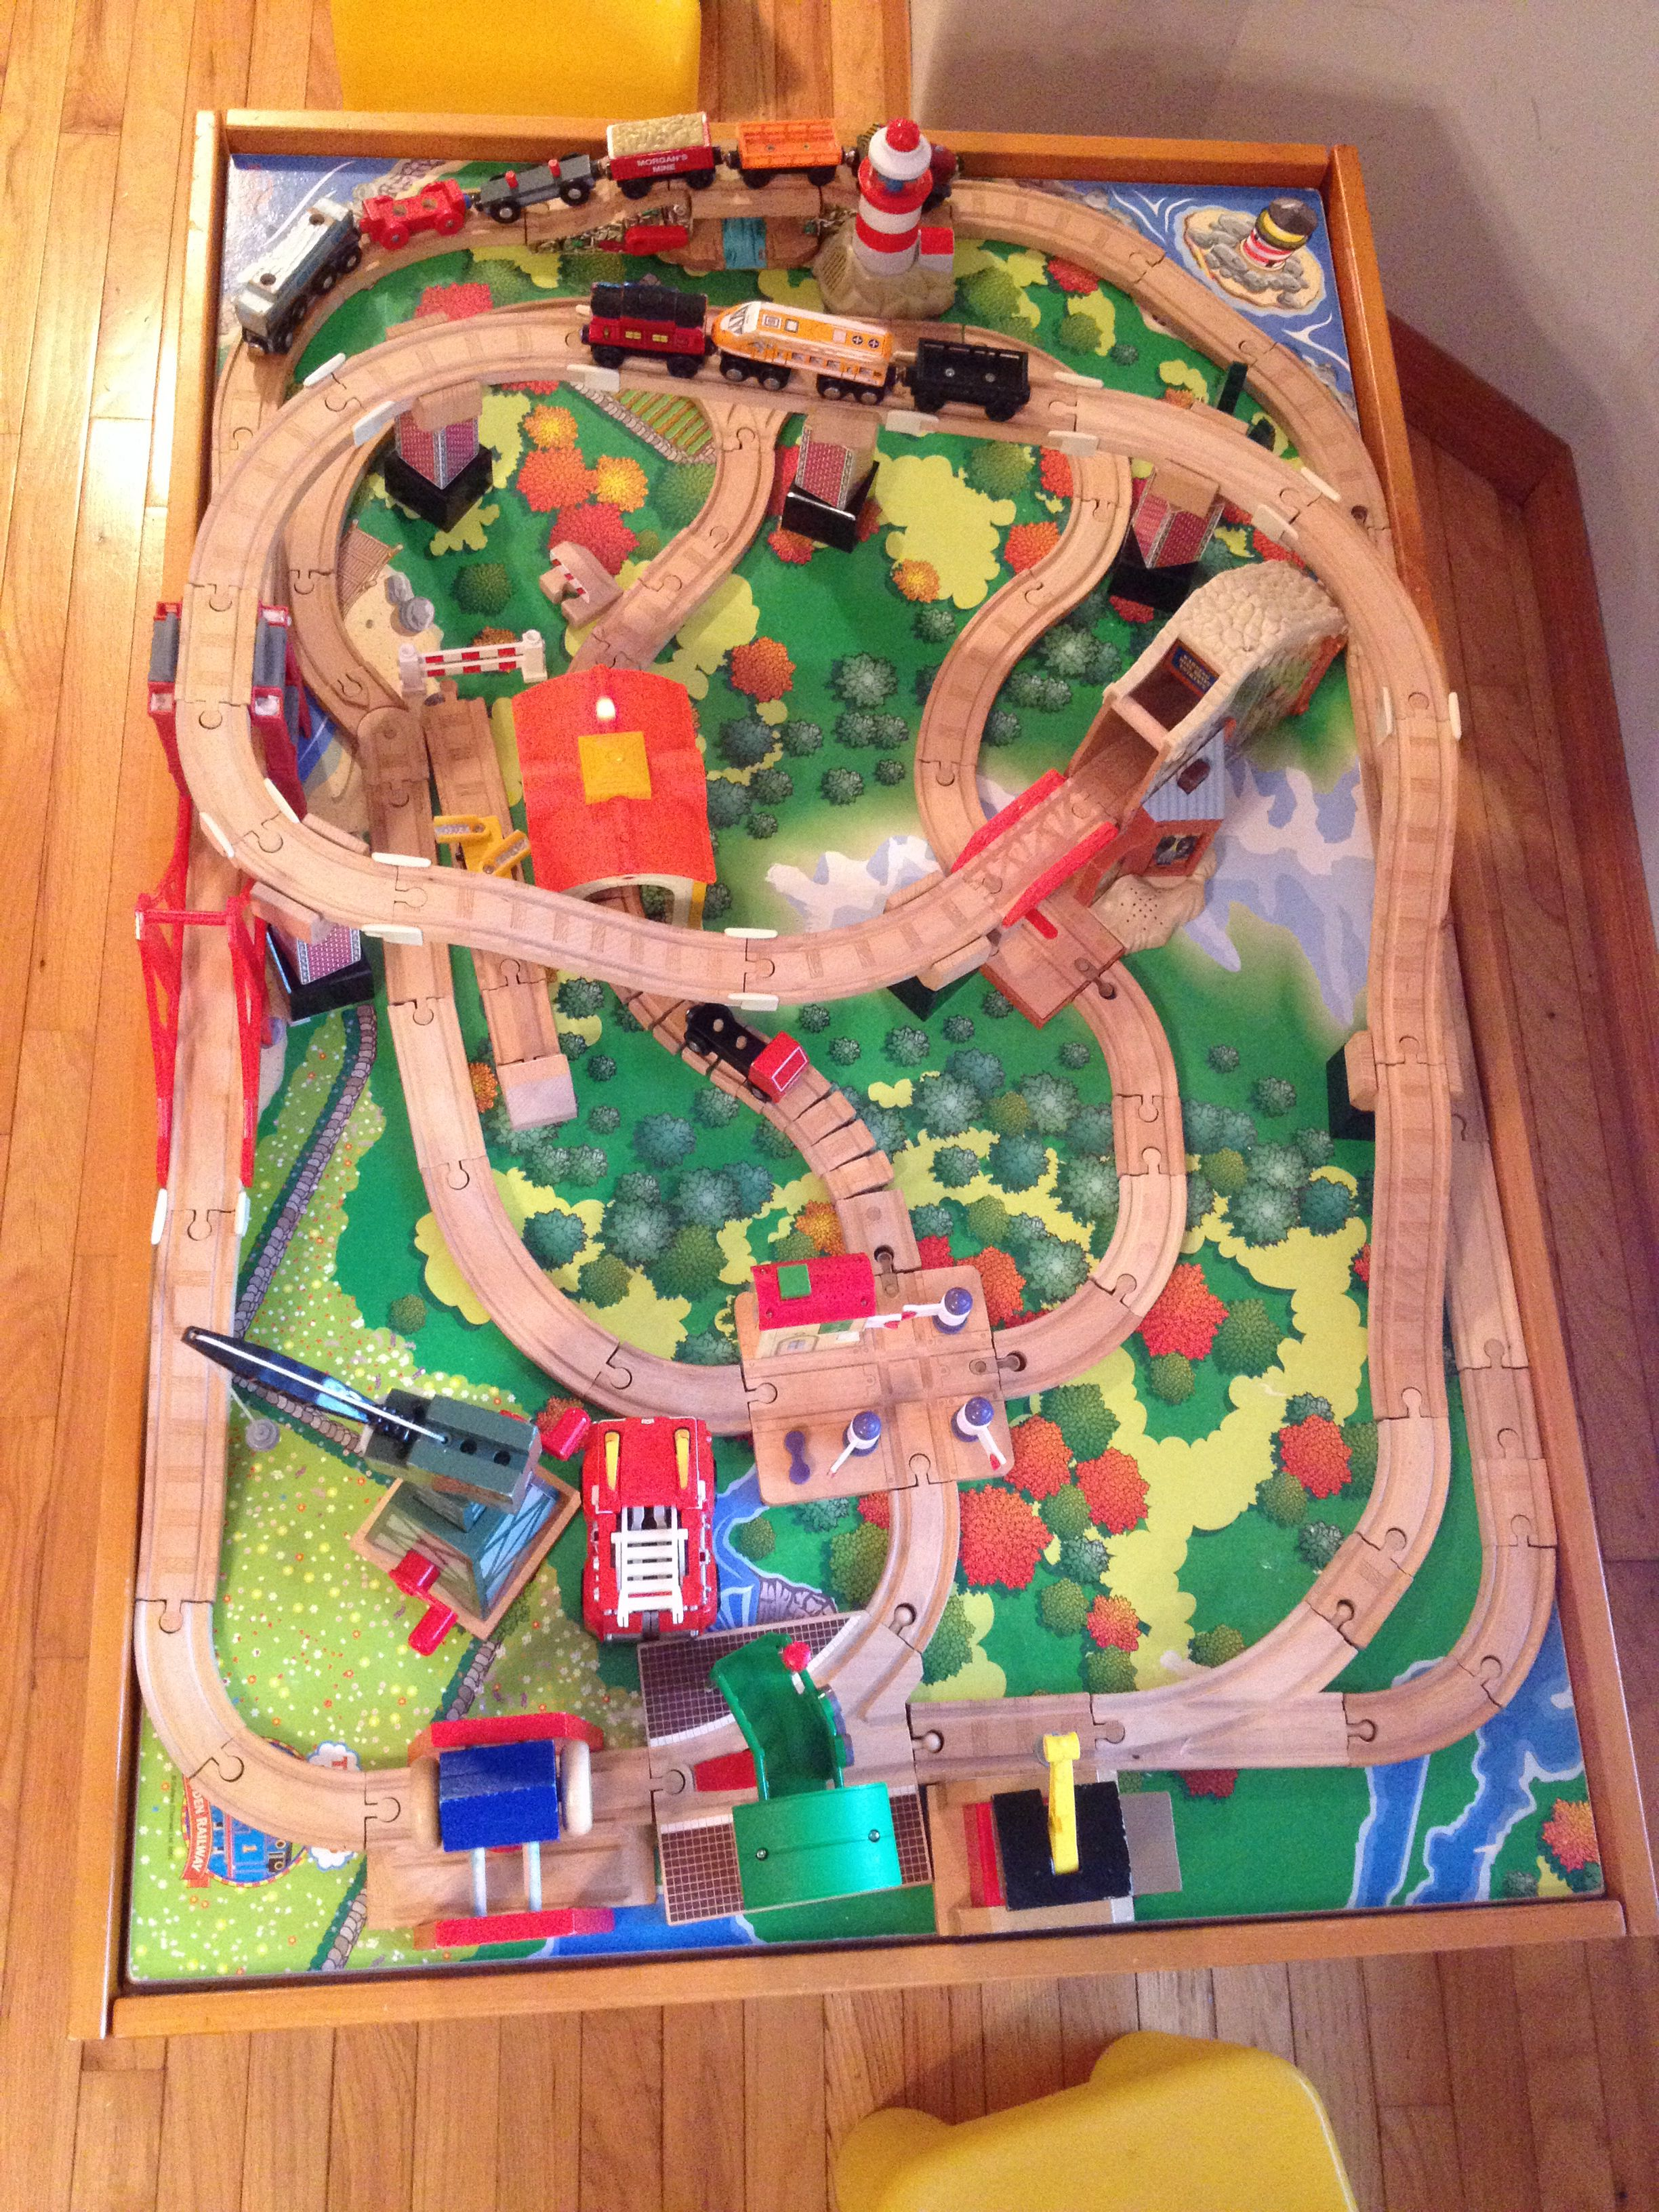 Thomas Wood Train Track Design On Thomas Table Toy